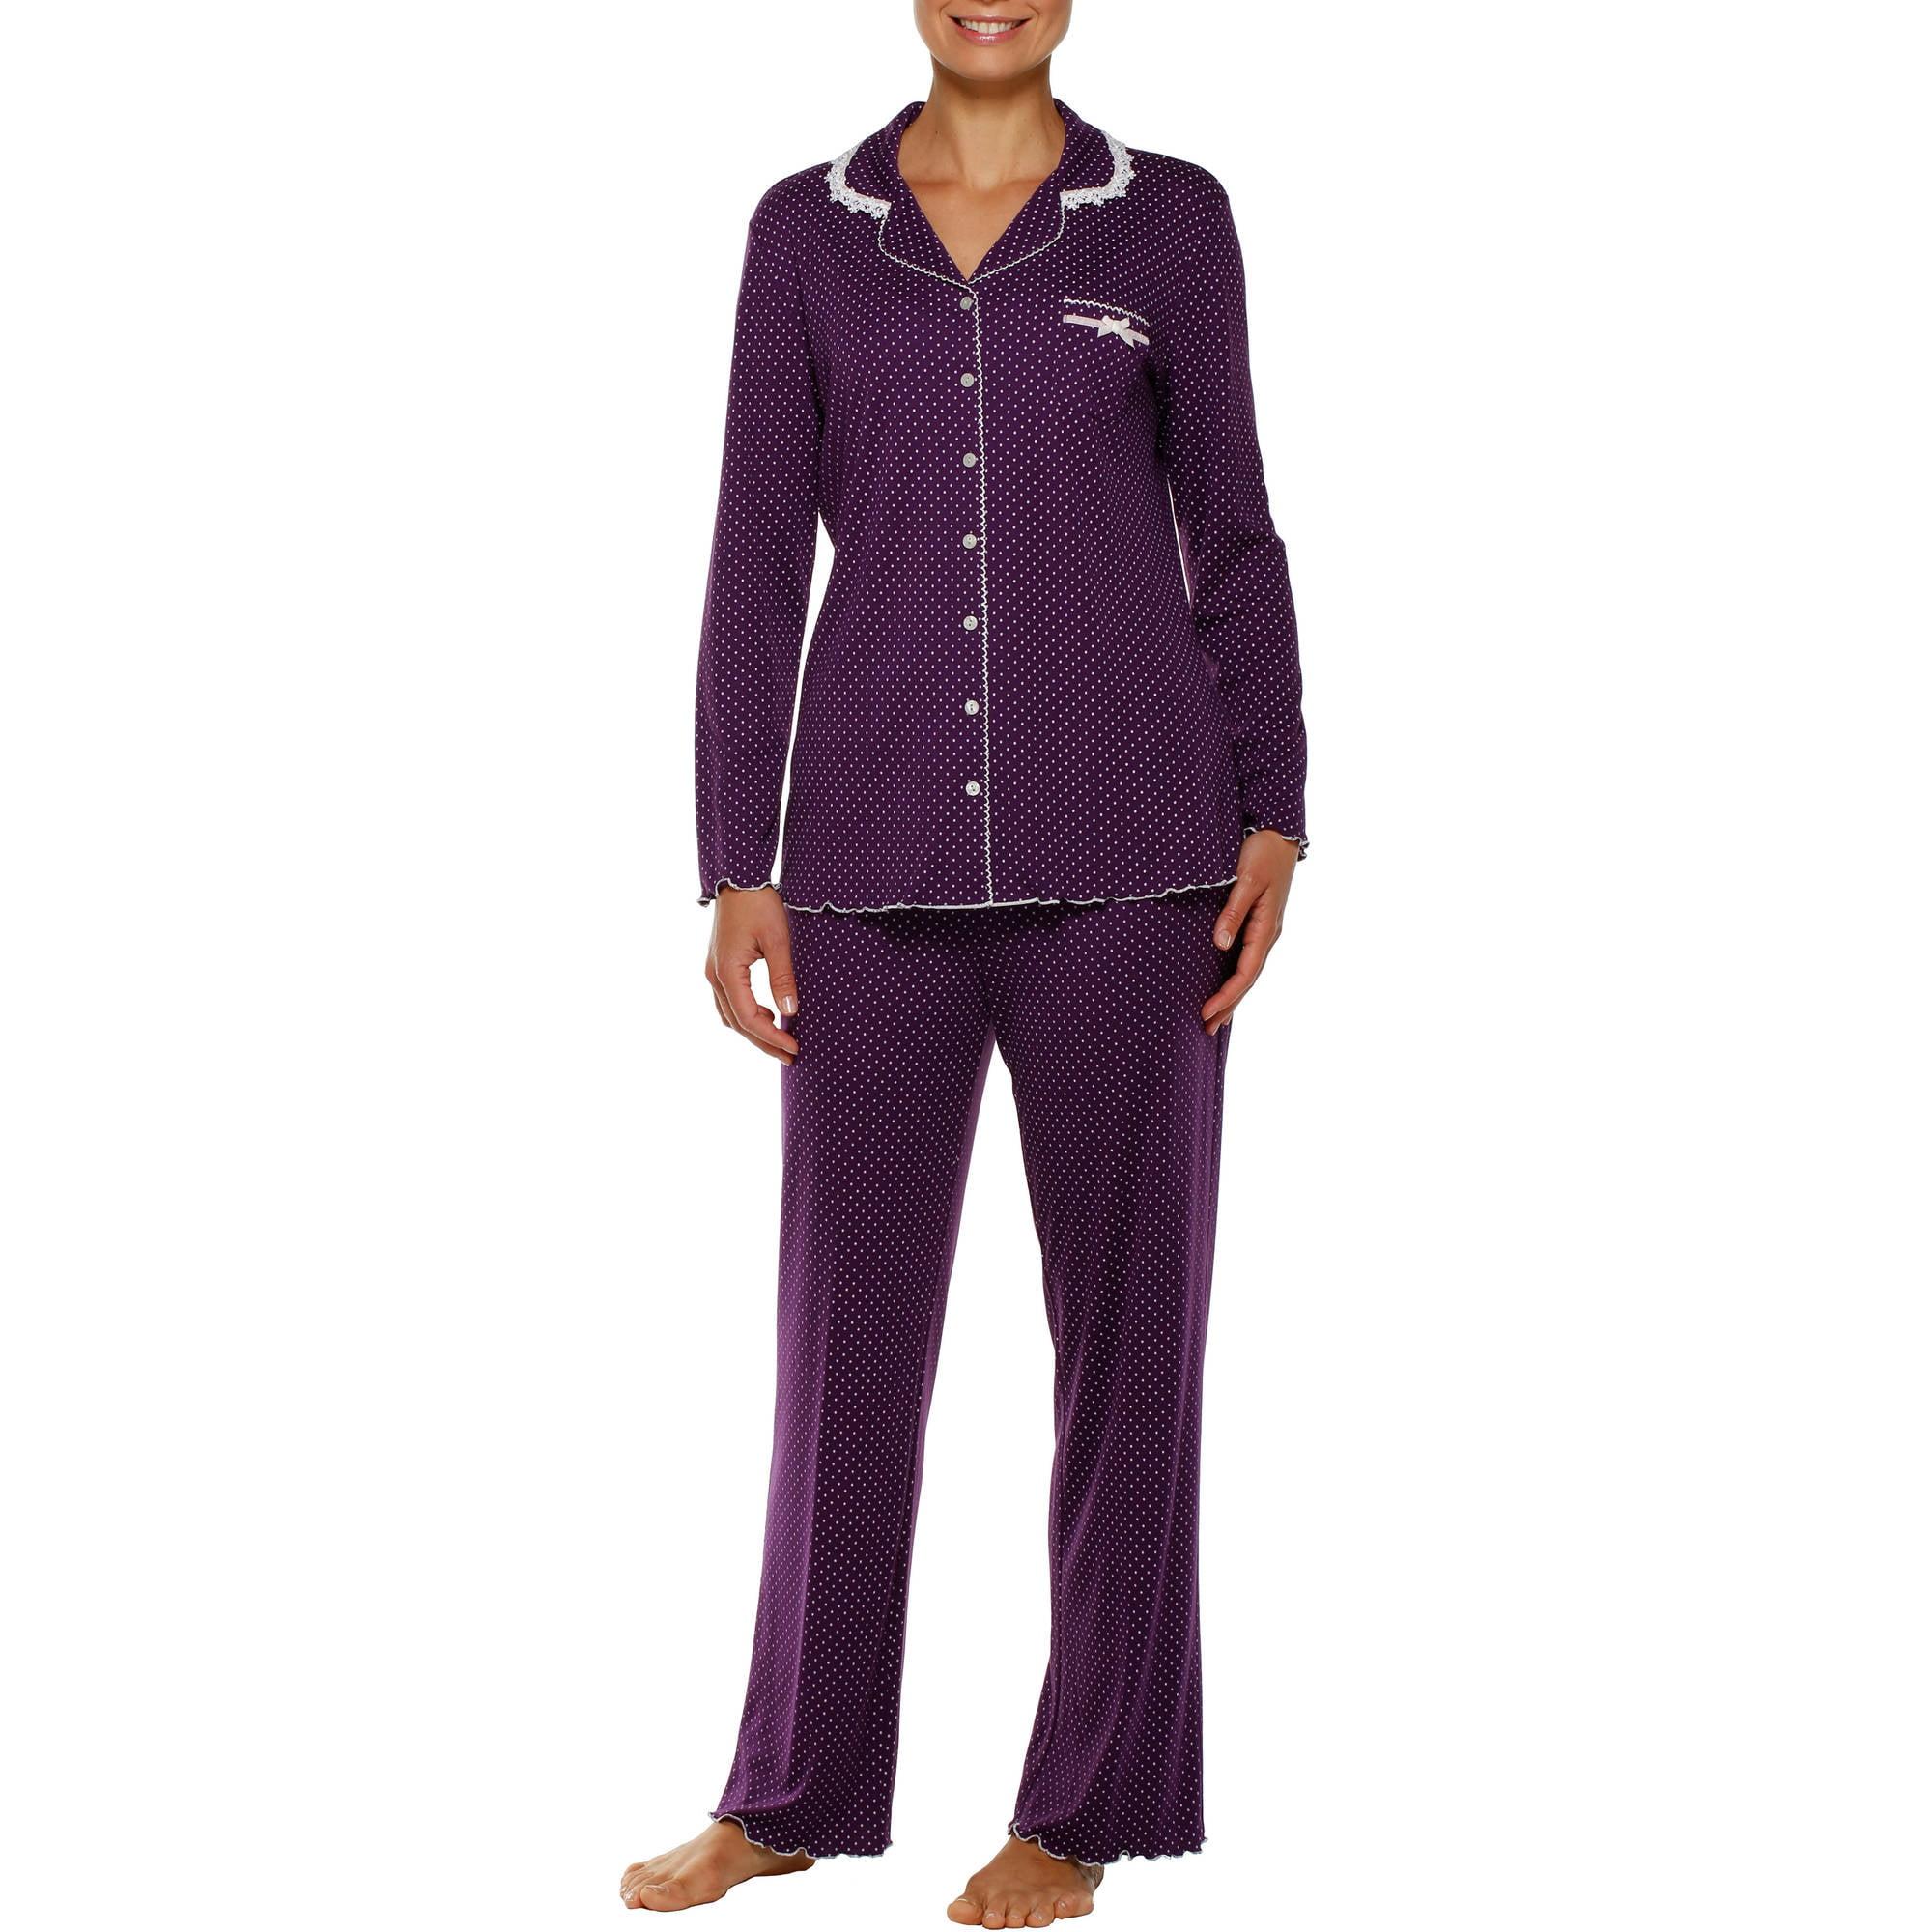 cacb8cee8c Angelina - Angelina Unisex Plush Poop One-Piece Novelty Sleep Lounge Wear  (1-Pack) - Walmart.com